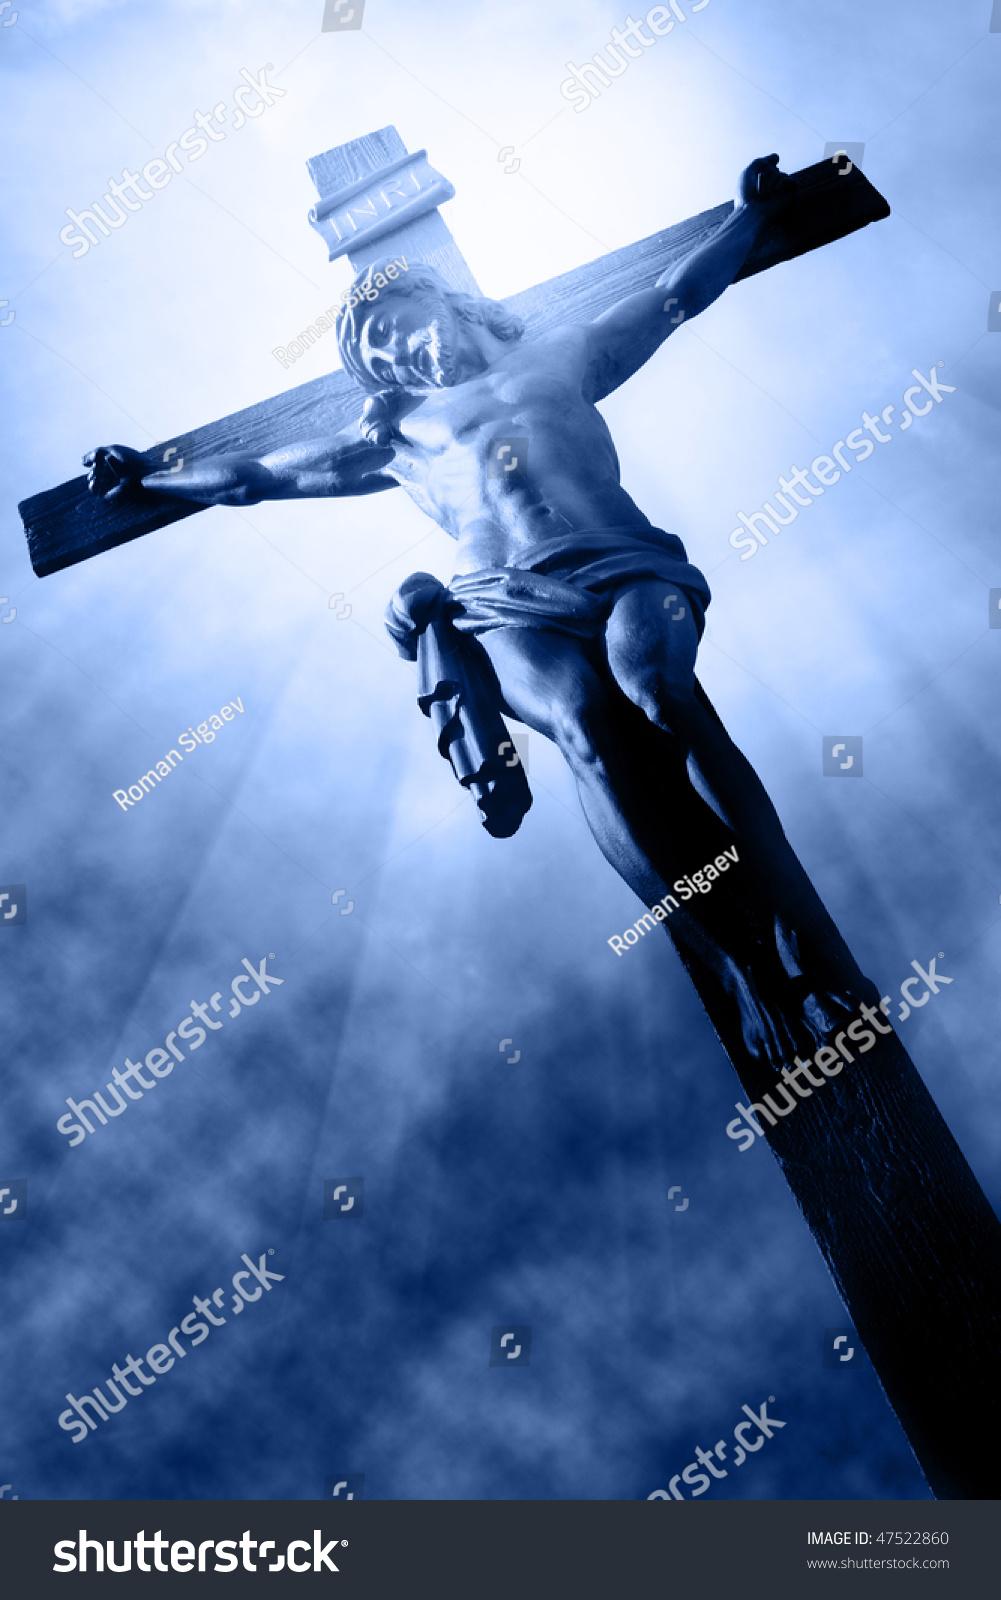 crucifixion jesus on cross stock photo 47522860 shutterstock